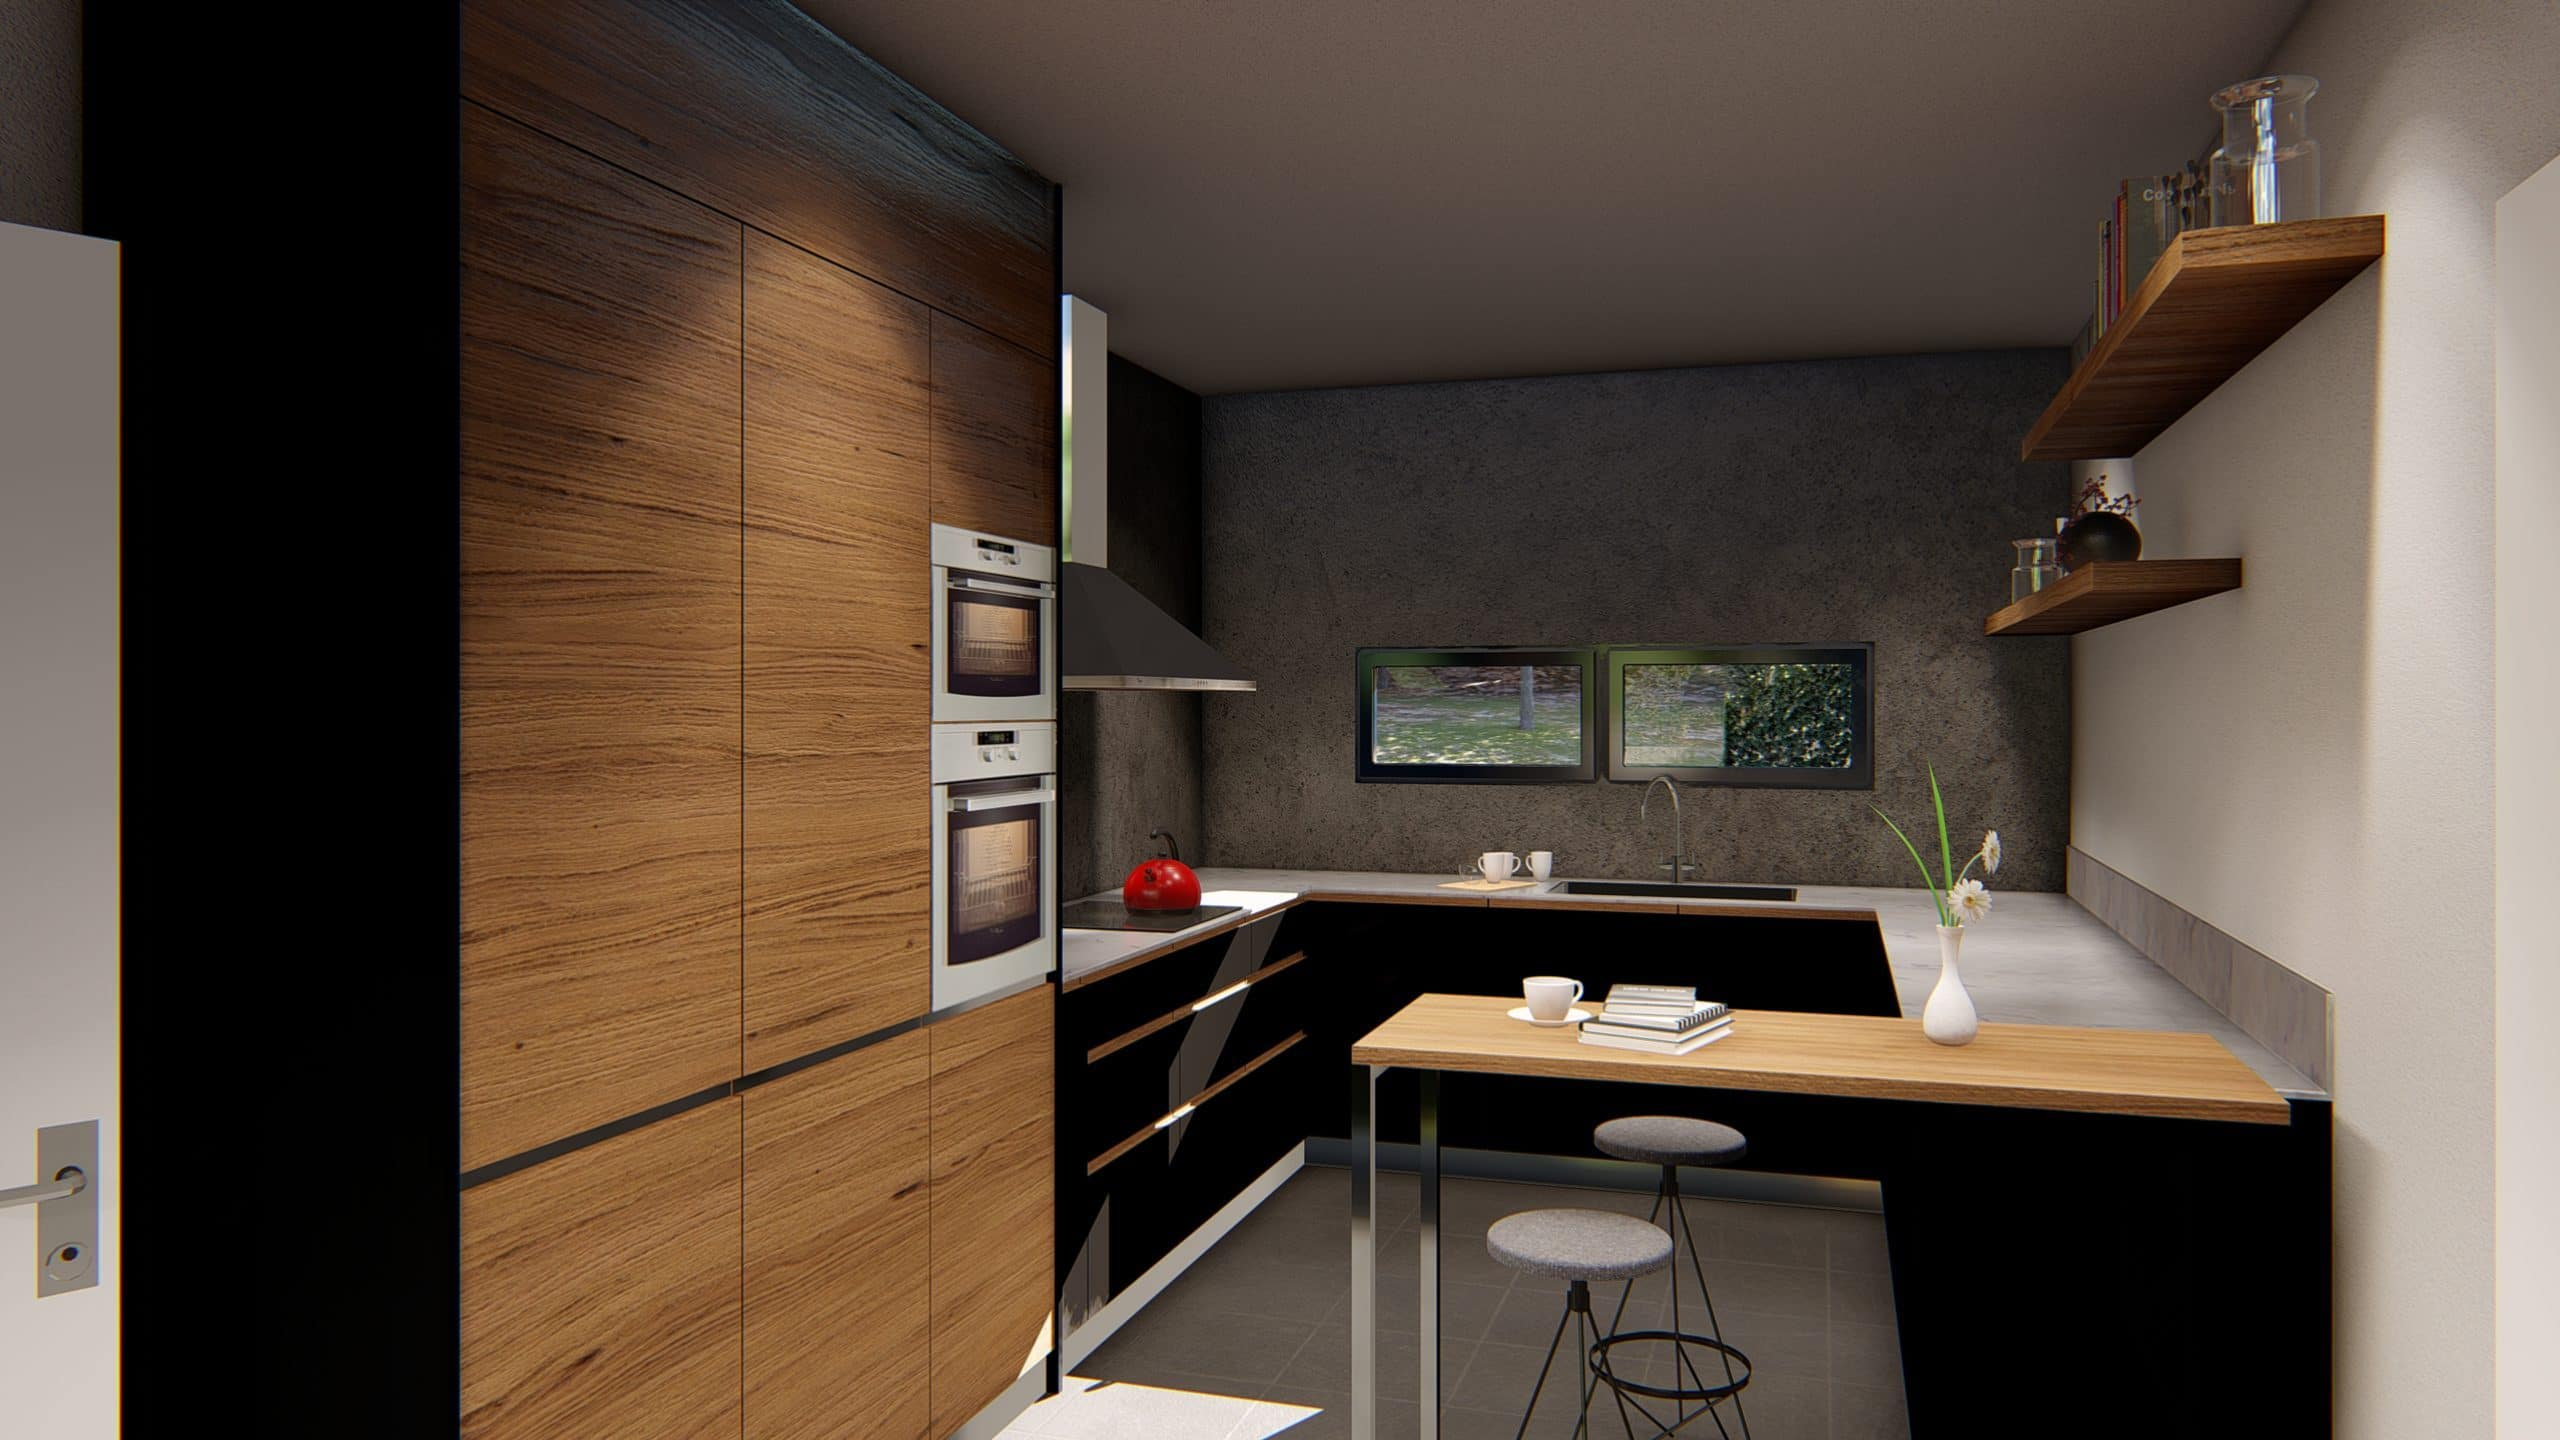 Casa prefabricada modelo Sant Cugat - interior